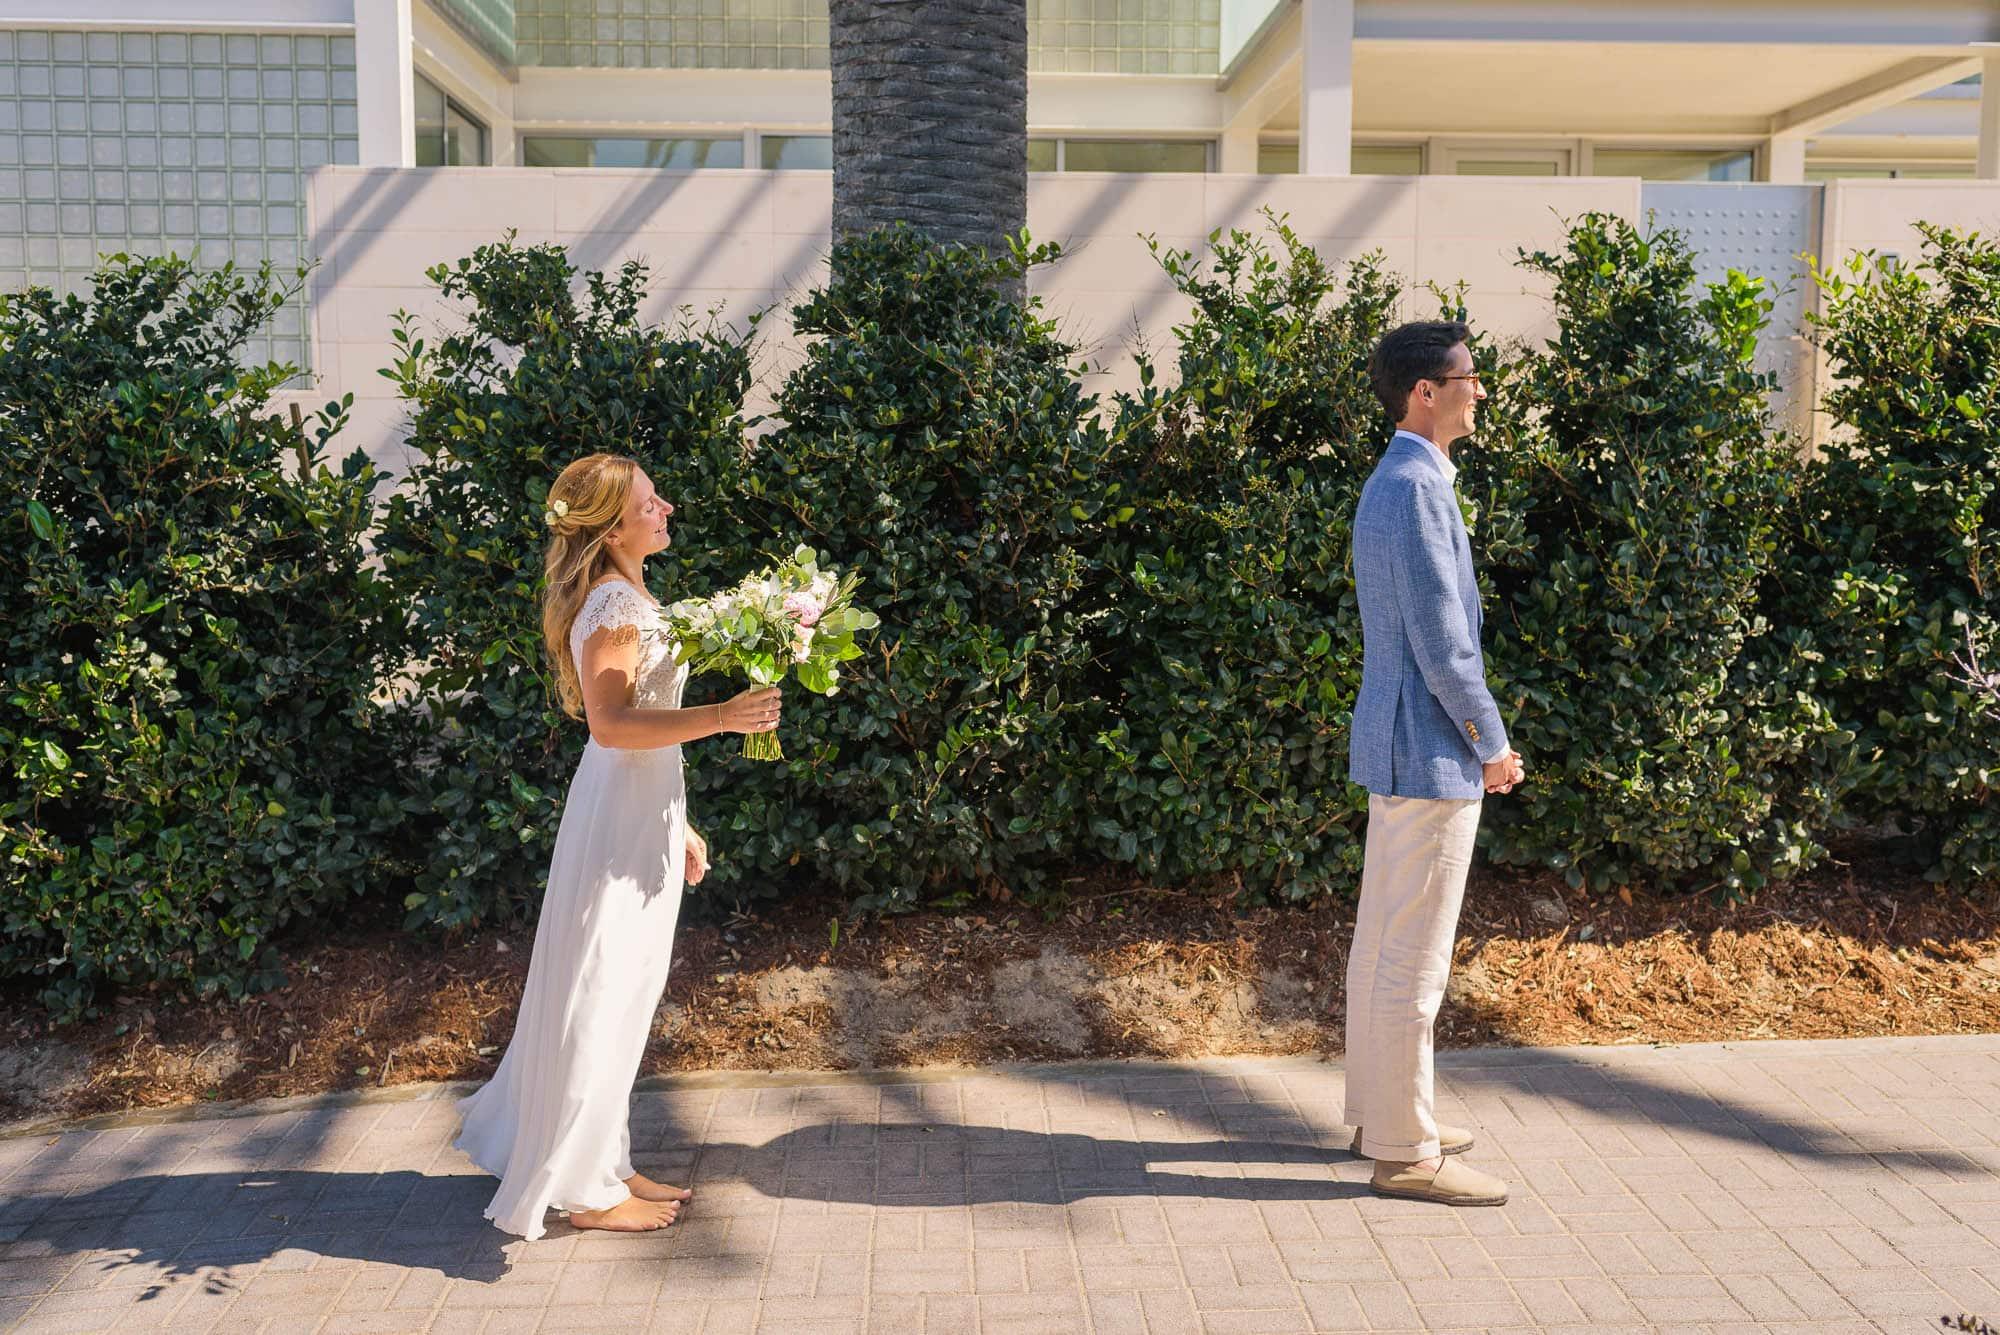 009_Alan_and_Heidi_Wedding_Verena_Andreas